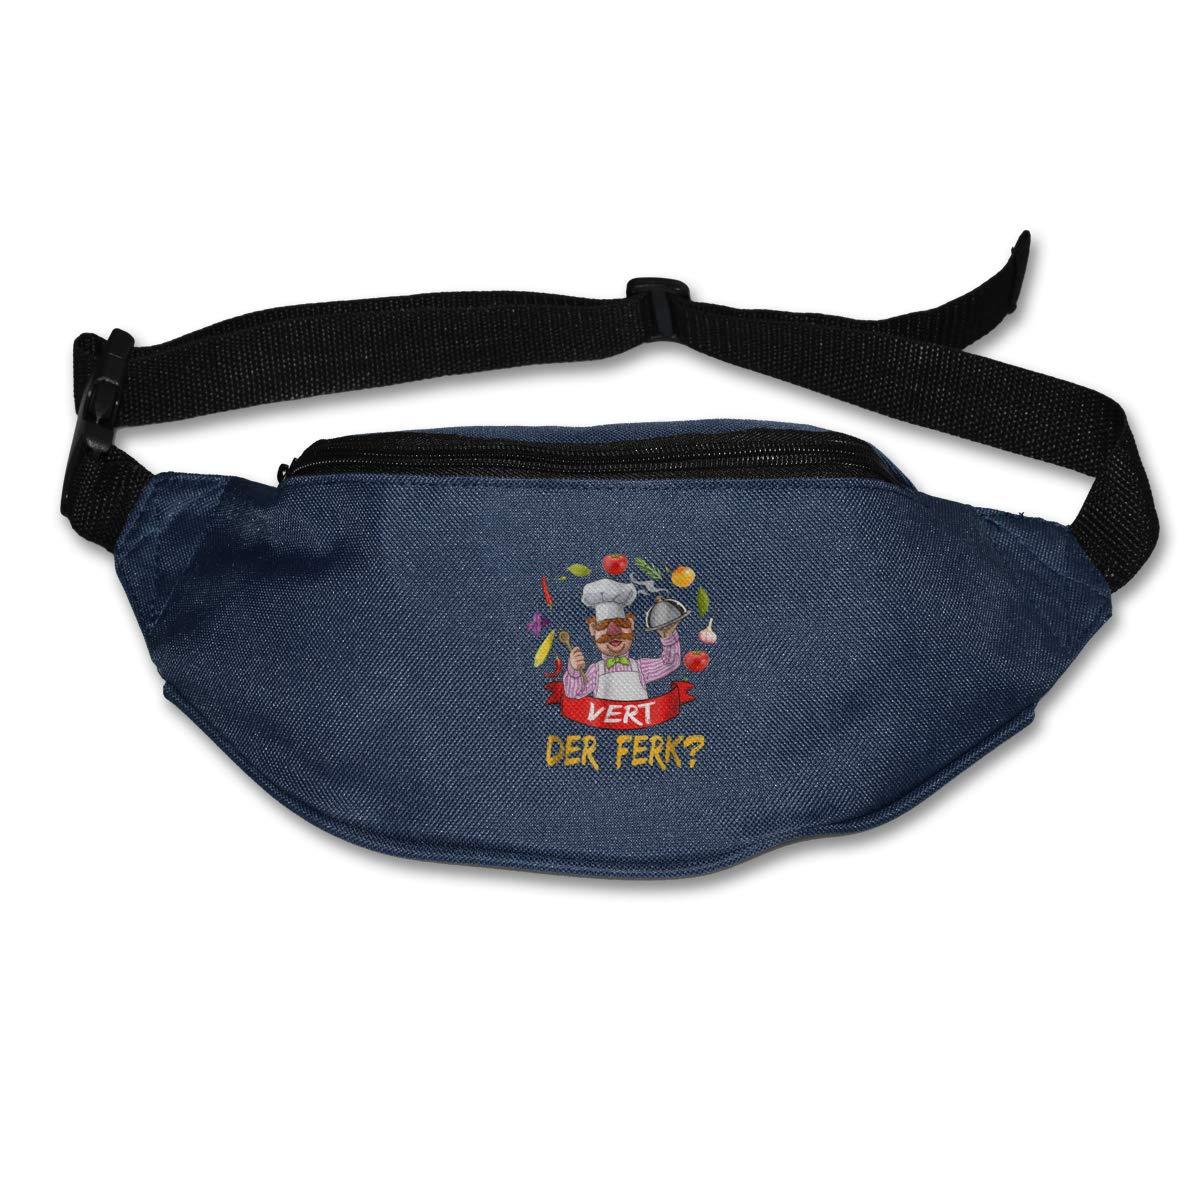 Vert Der Ferk Sport Waist Bag Fanny Pack Adjustable For Run